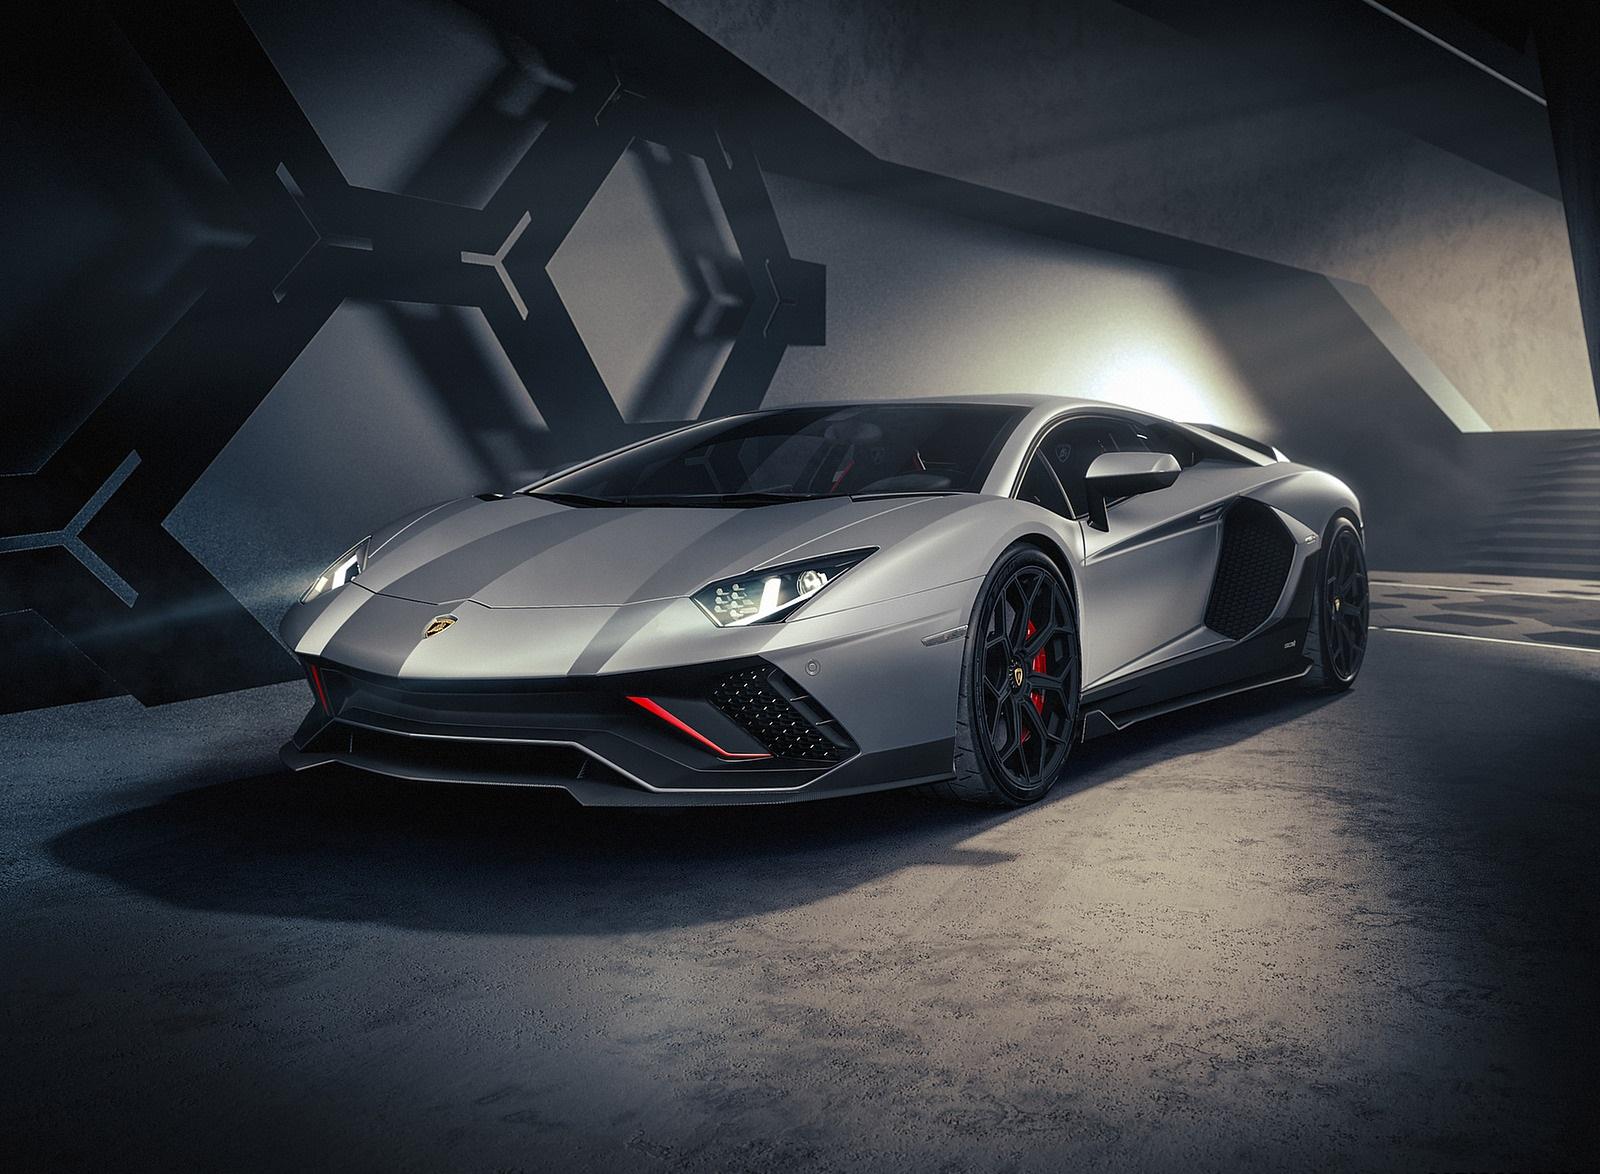 2022 Lamborghini Aventador LP 780-4 Ultimae Front Three-Quarter Wallpapers (10)